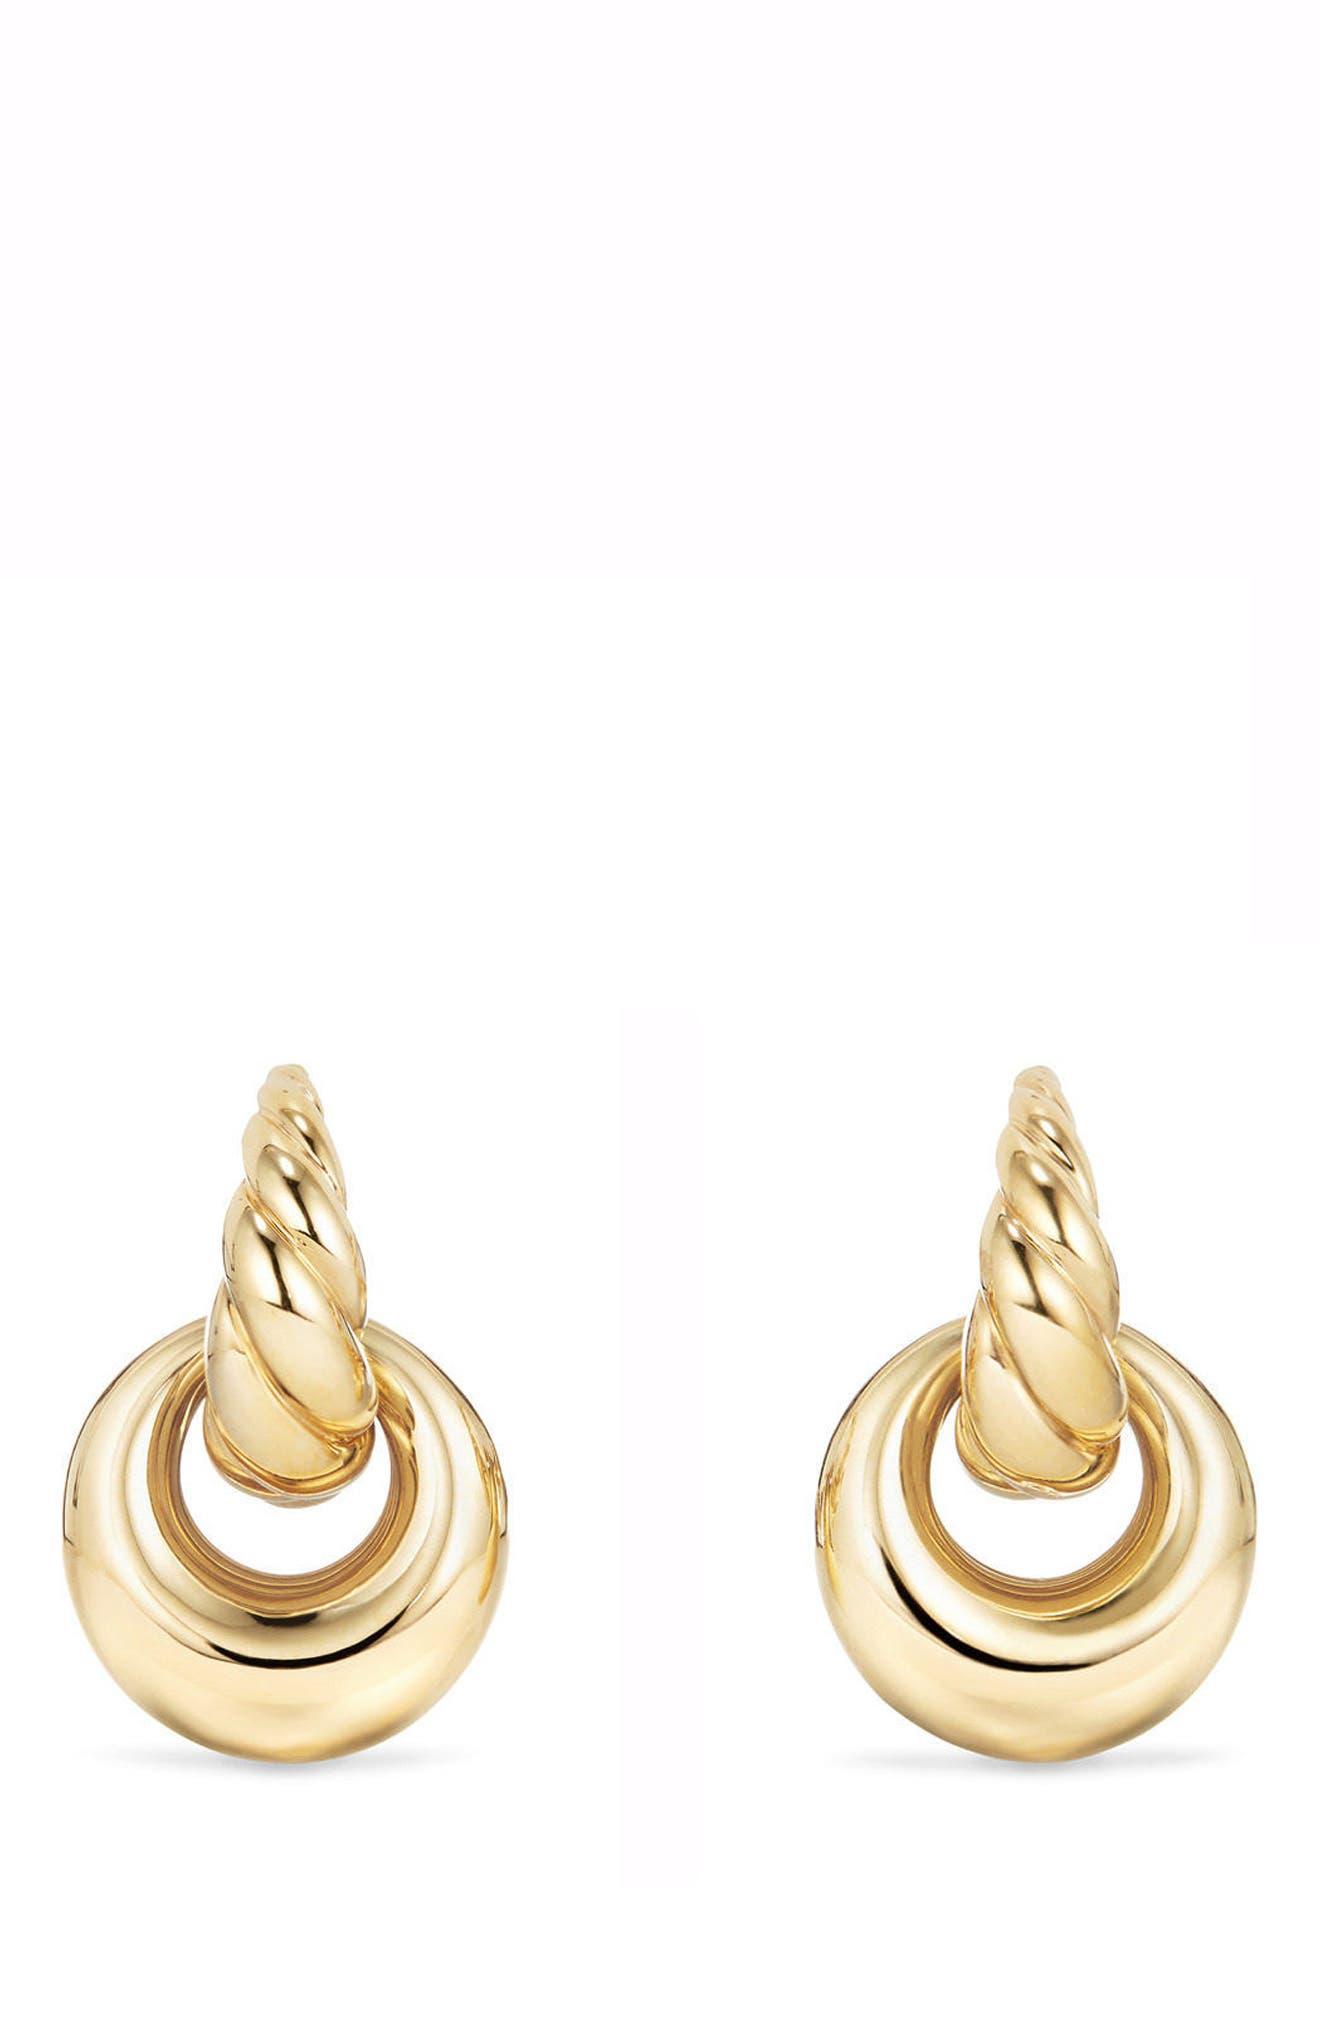 DAVID YURMAN Pure Form<sup>®</sup> Drop Earrings in 18K Yellow Gold, Main, color, YELLOW GOLD